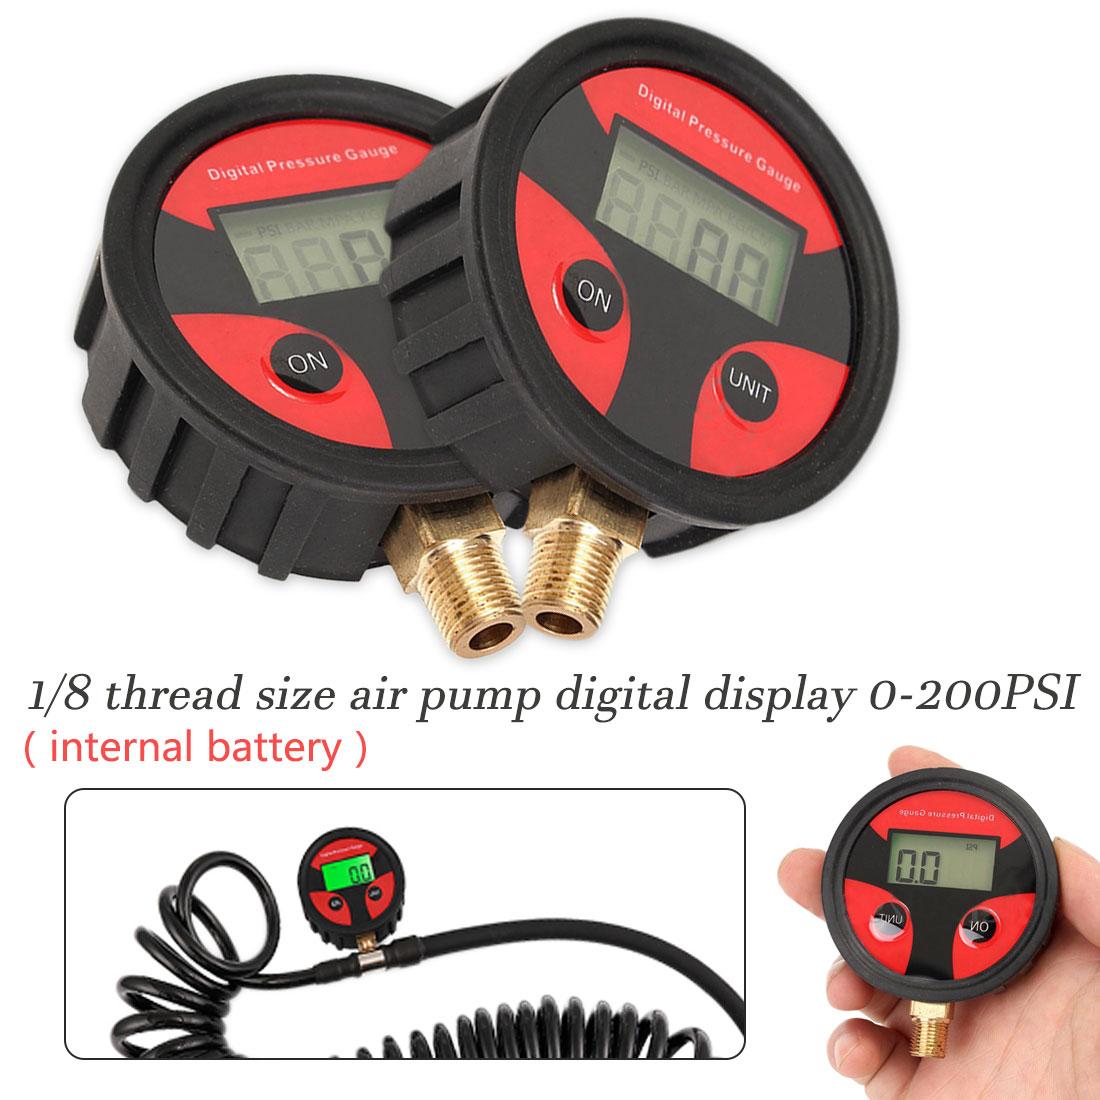 Digital Display Tire Pressure Gauge 0-200PSI Inflatable Pump Digital Display Truck Tire Pressure Gauge Tire Air Pressure